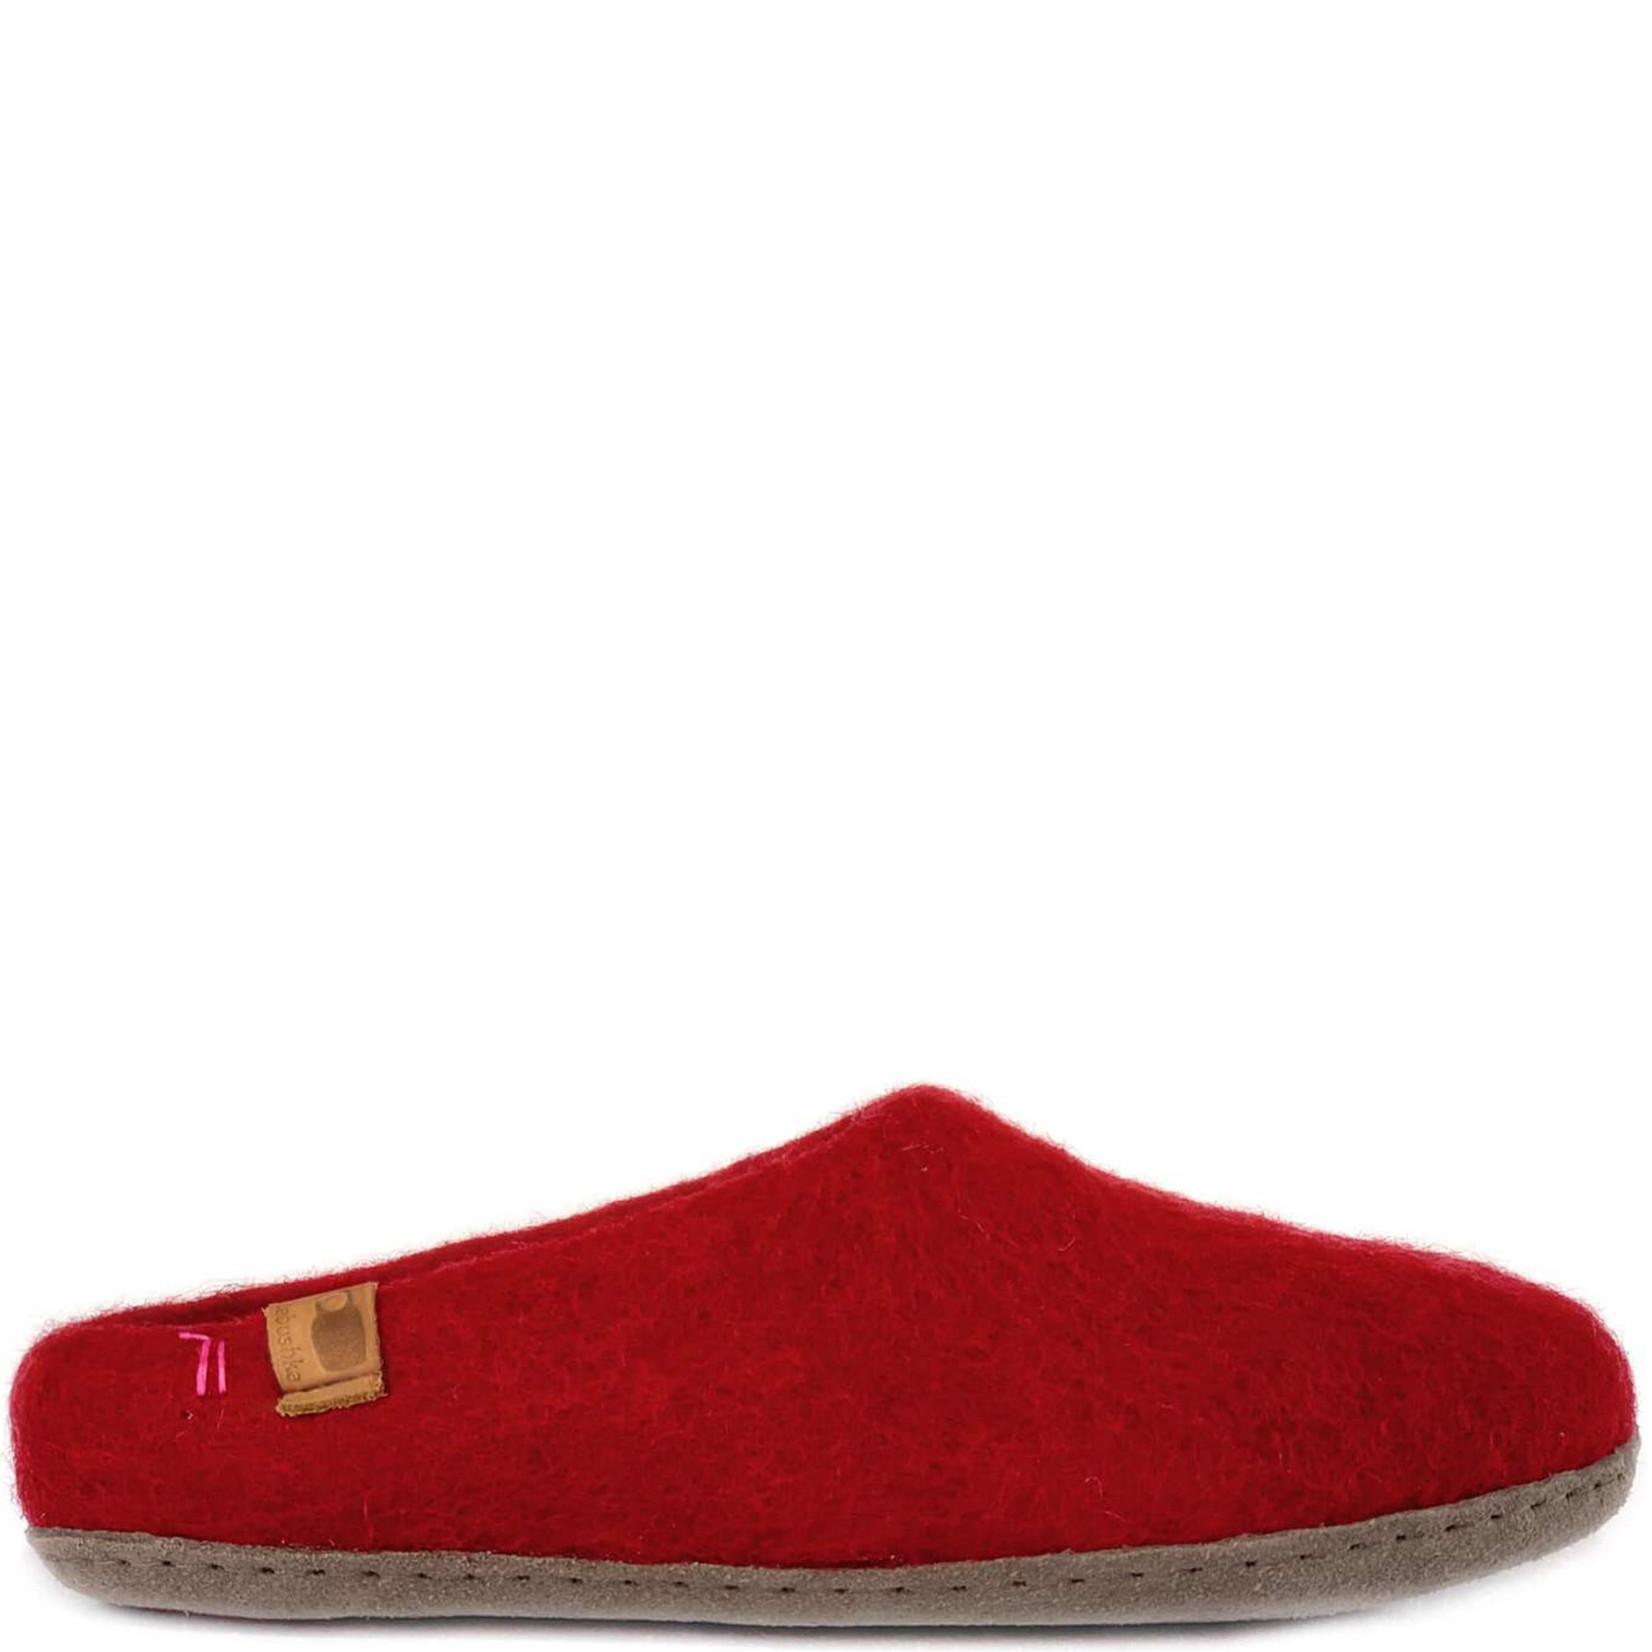 Baabushka Wool Slippers Red